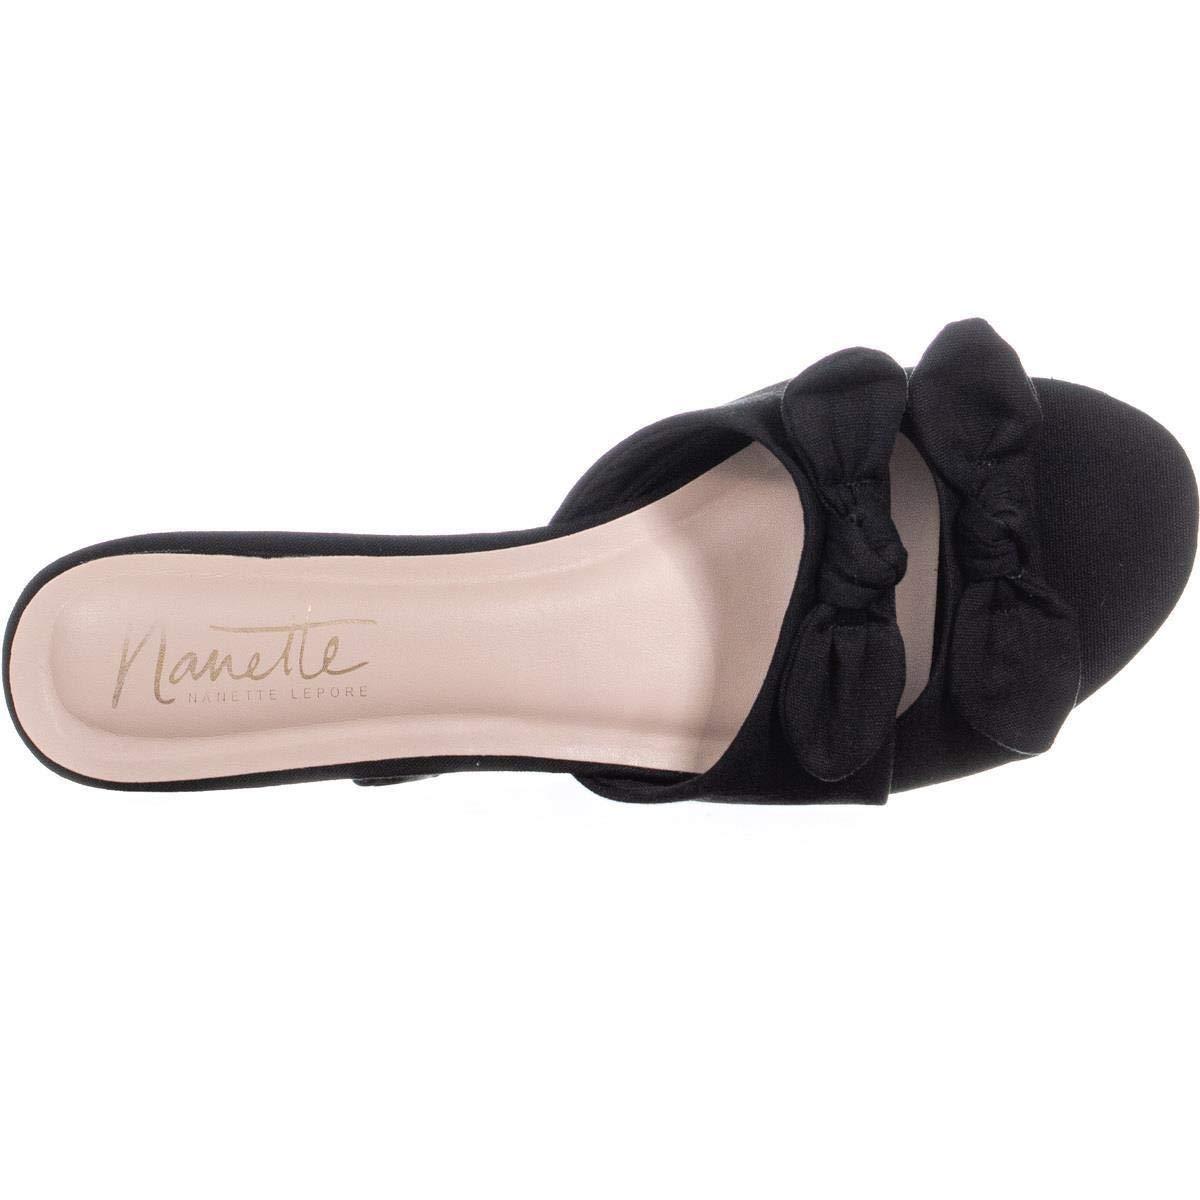 Nanette Nanette Lepore Womens Kendra Knotted Dress Flat Sandals